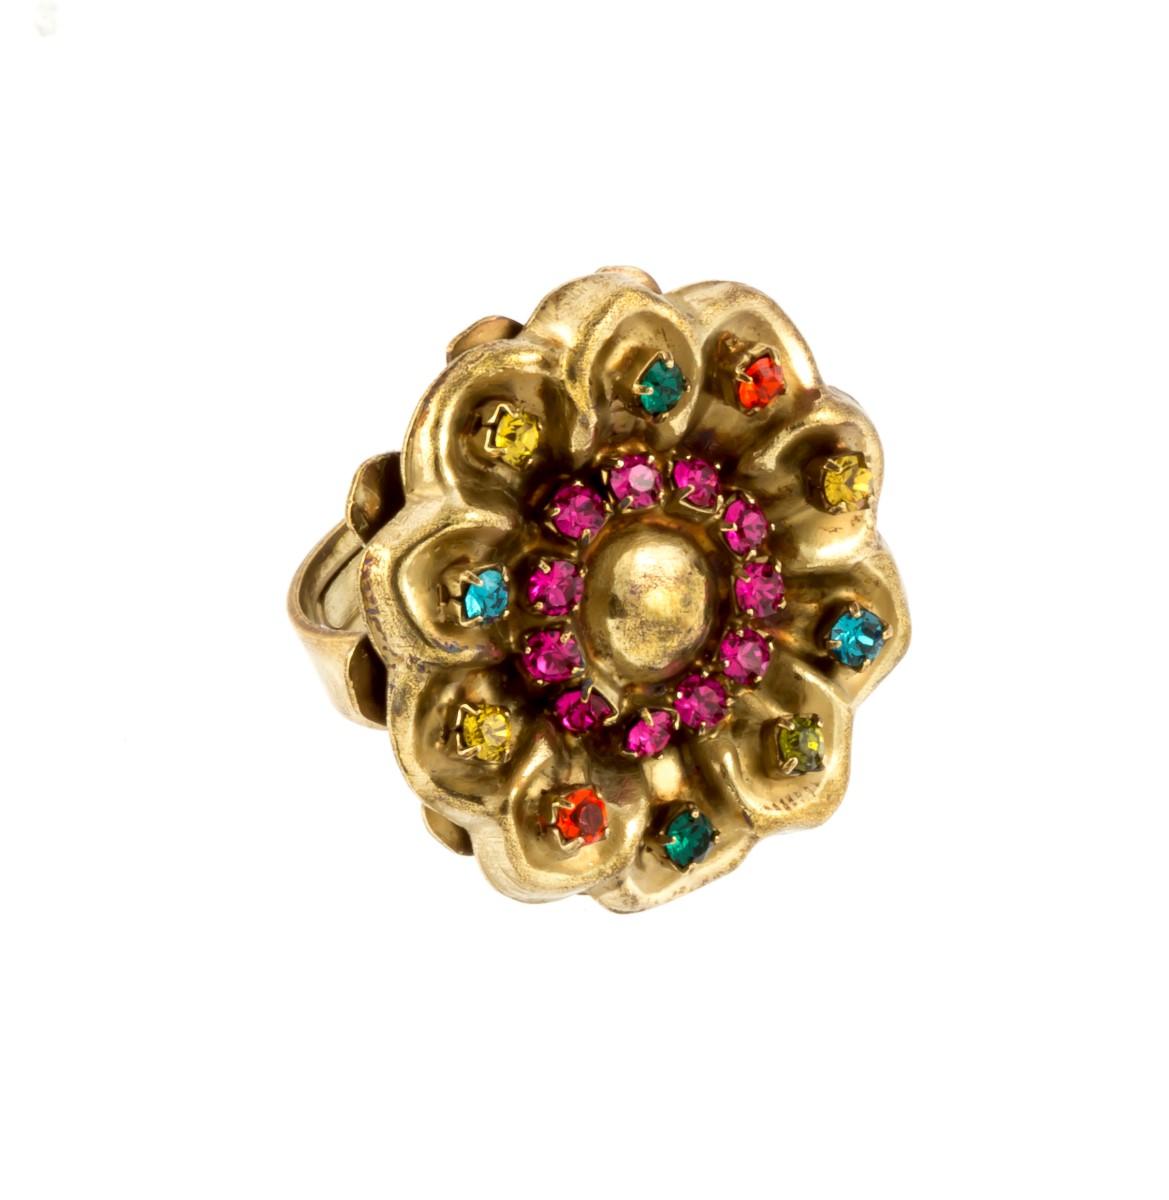 ARTWEAR DIMITRIADIS - Γυναικείο δαχτυλίδι μπρονζέ ARTWEAR DIMITRIADIS με πολύχρω γυναικεία αξεσουάρ κοσμήματα δαχτυλίδια